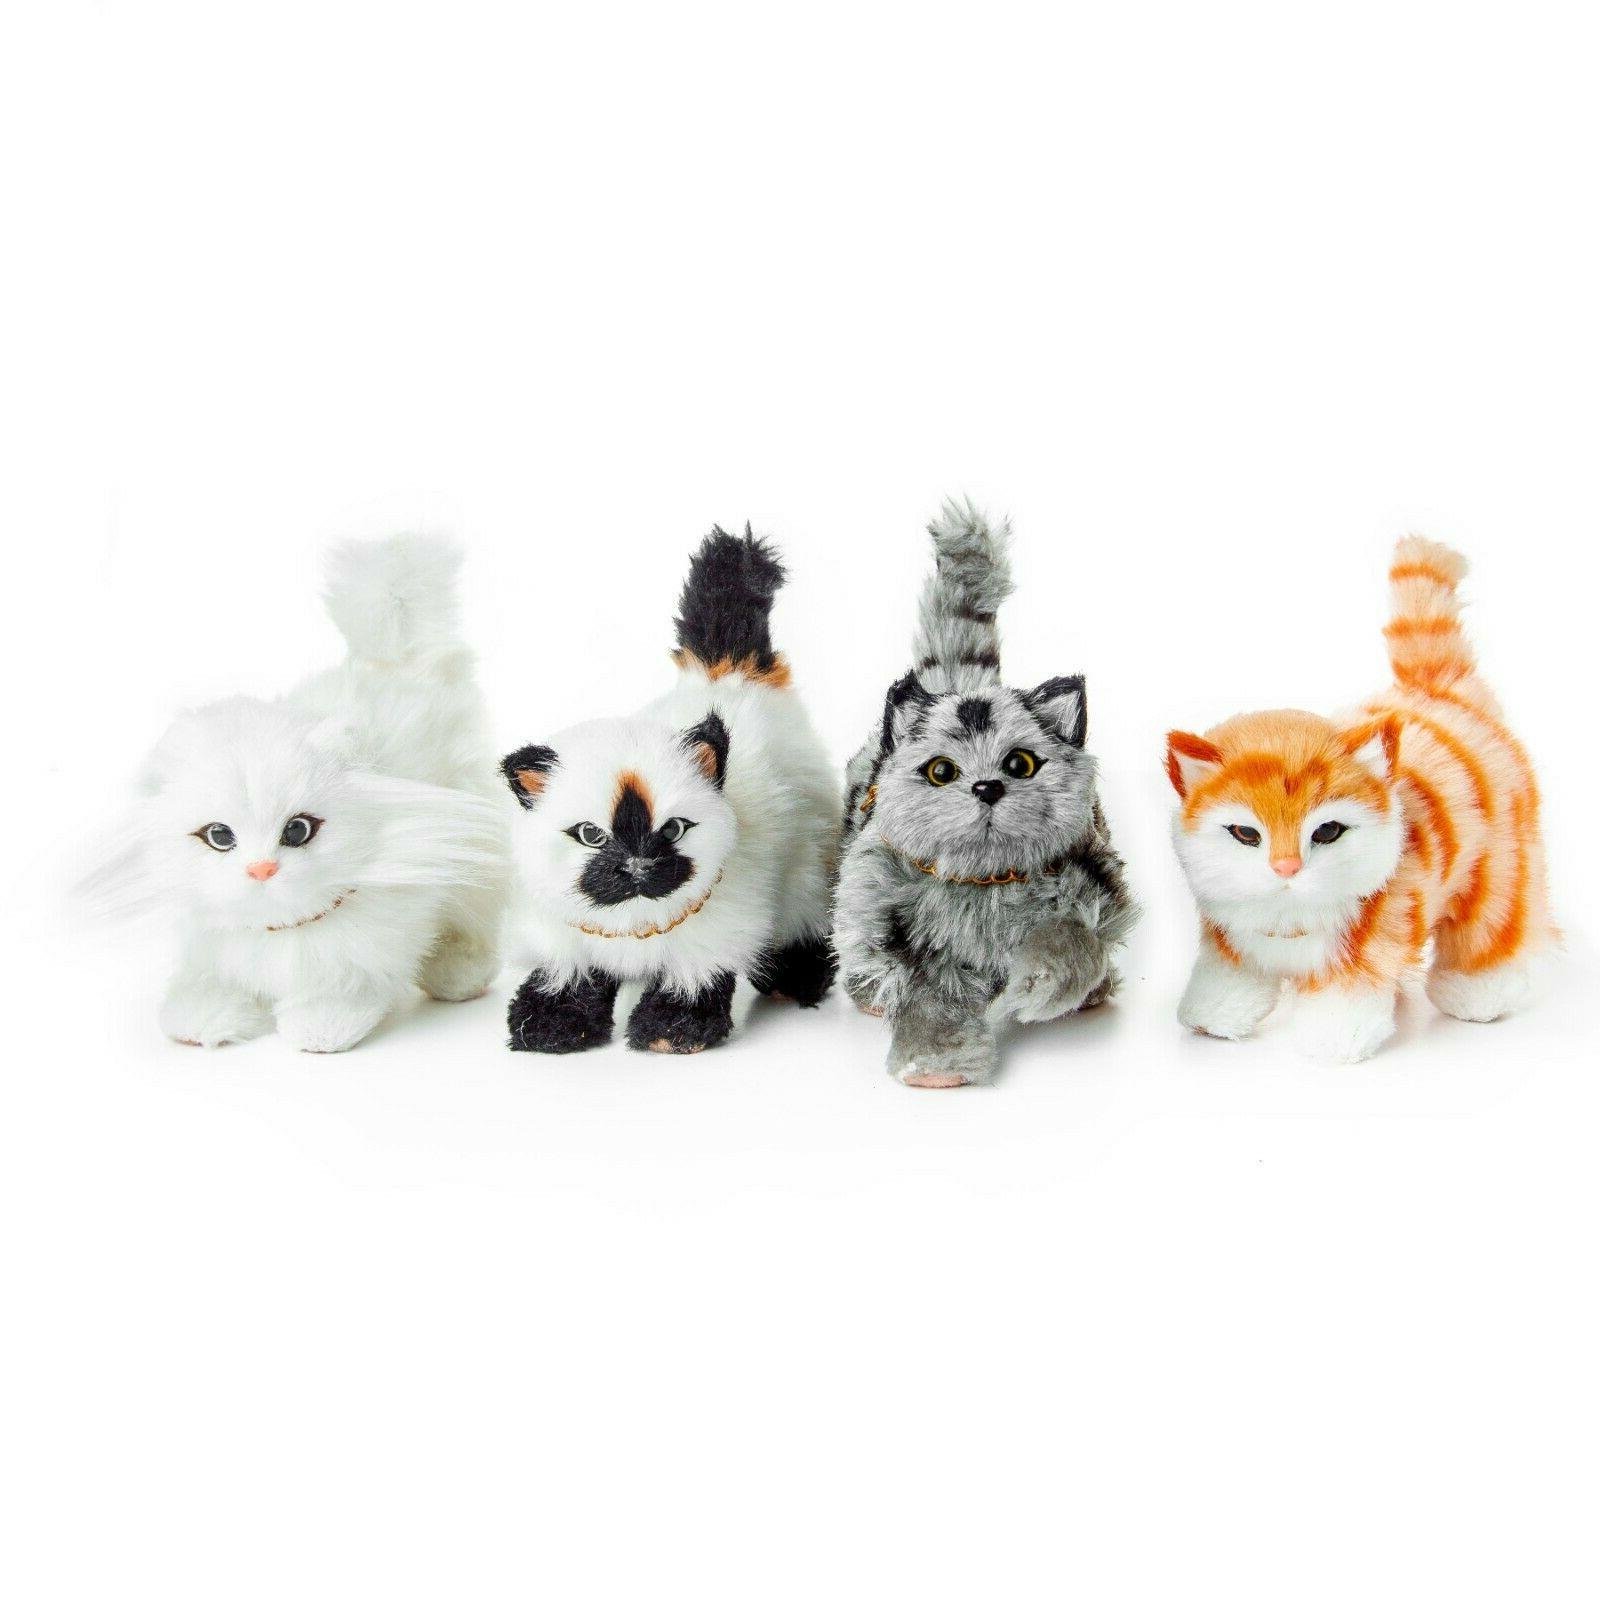 Pets 18 Inch Dolls, Set of Cat Compatible American Dolls